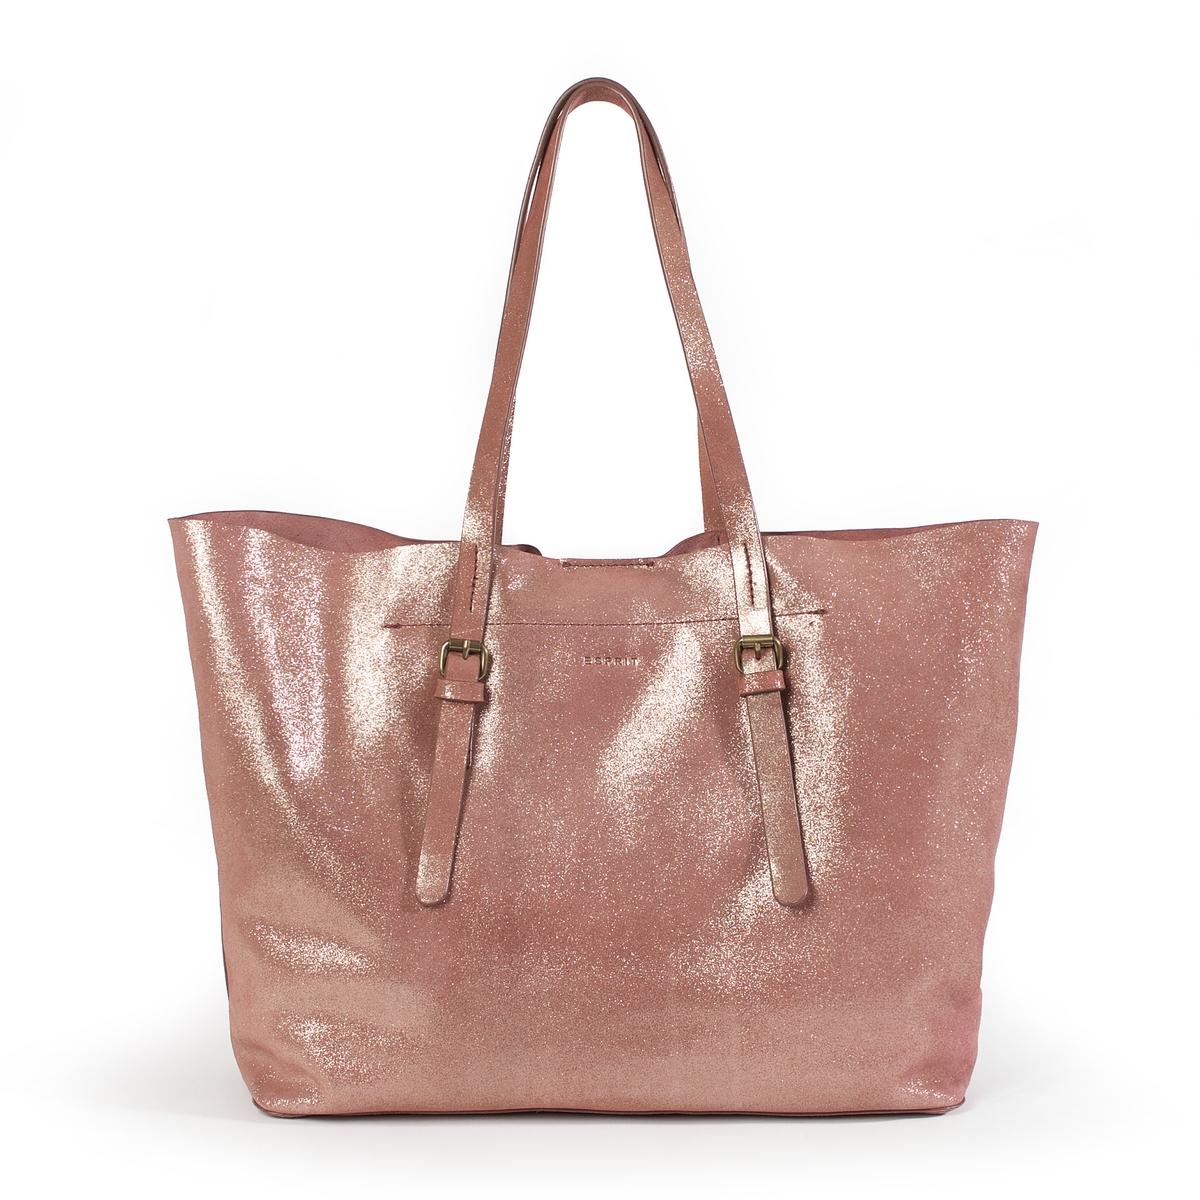 Сумка-шоппер Venus сумка esprit cc6010f 469